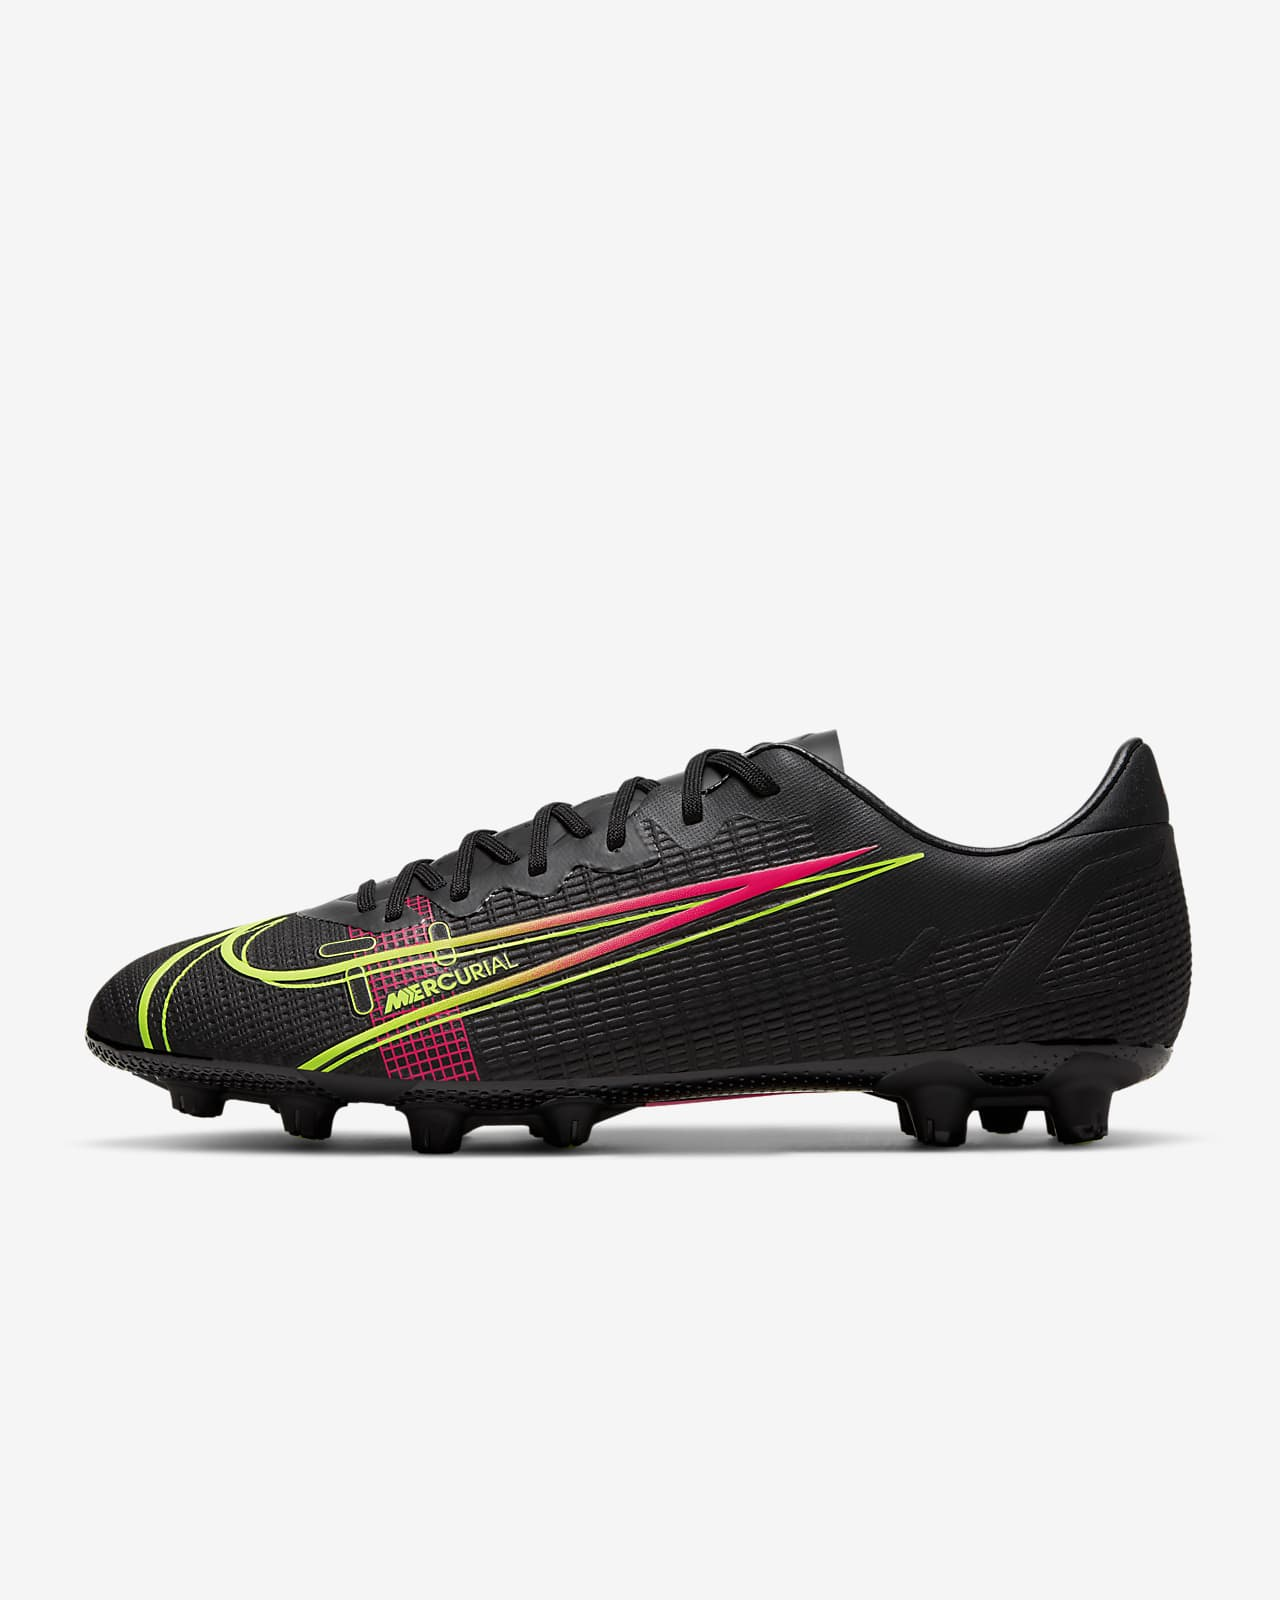 Nike Mercurial Vapor 14 Pro HG Hard-Ground Soccer Cleat